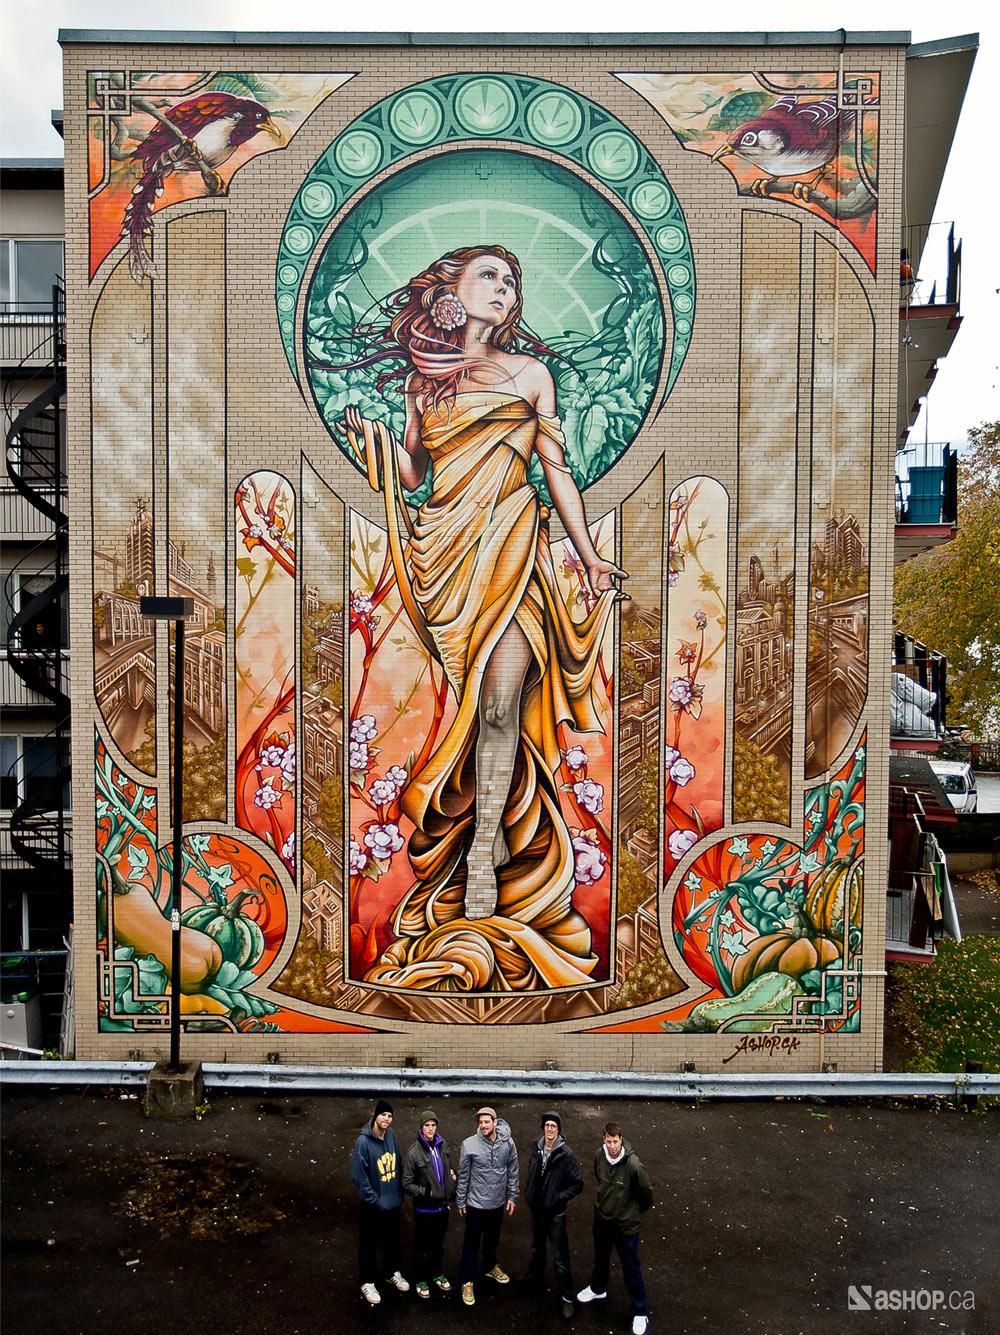 our_lady_grace_ashop_a'shop_mural_murales_graffiti_street_art_montreal_paint_fluke_axe_dodo_phile_zek_WEB.jpg